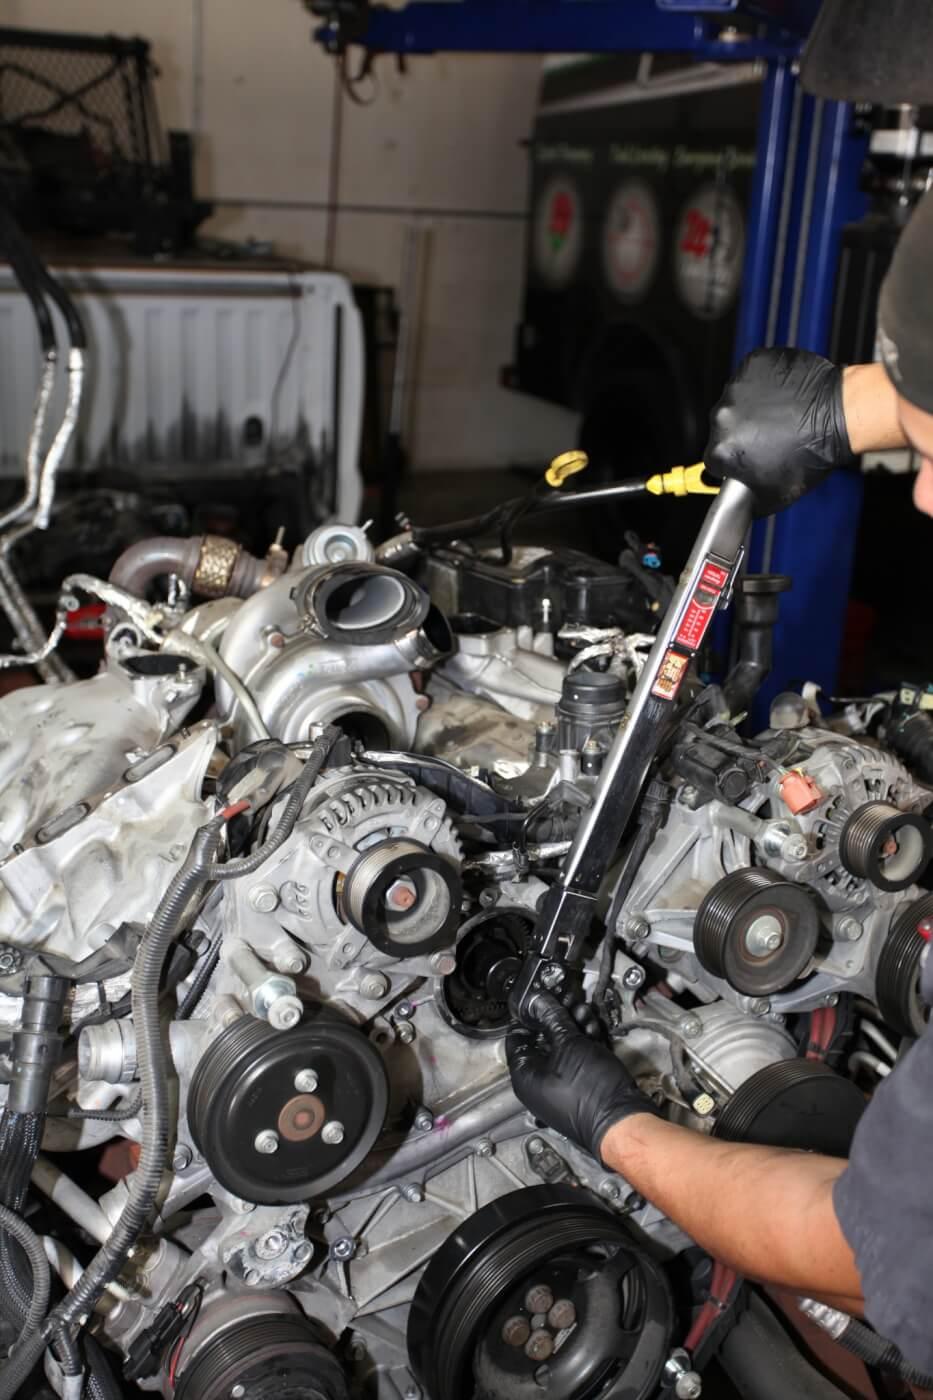 Diesel Exhaust Fluid Misuse